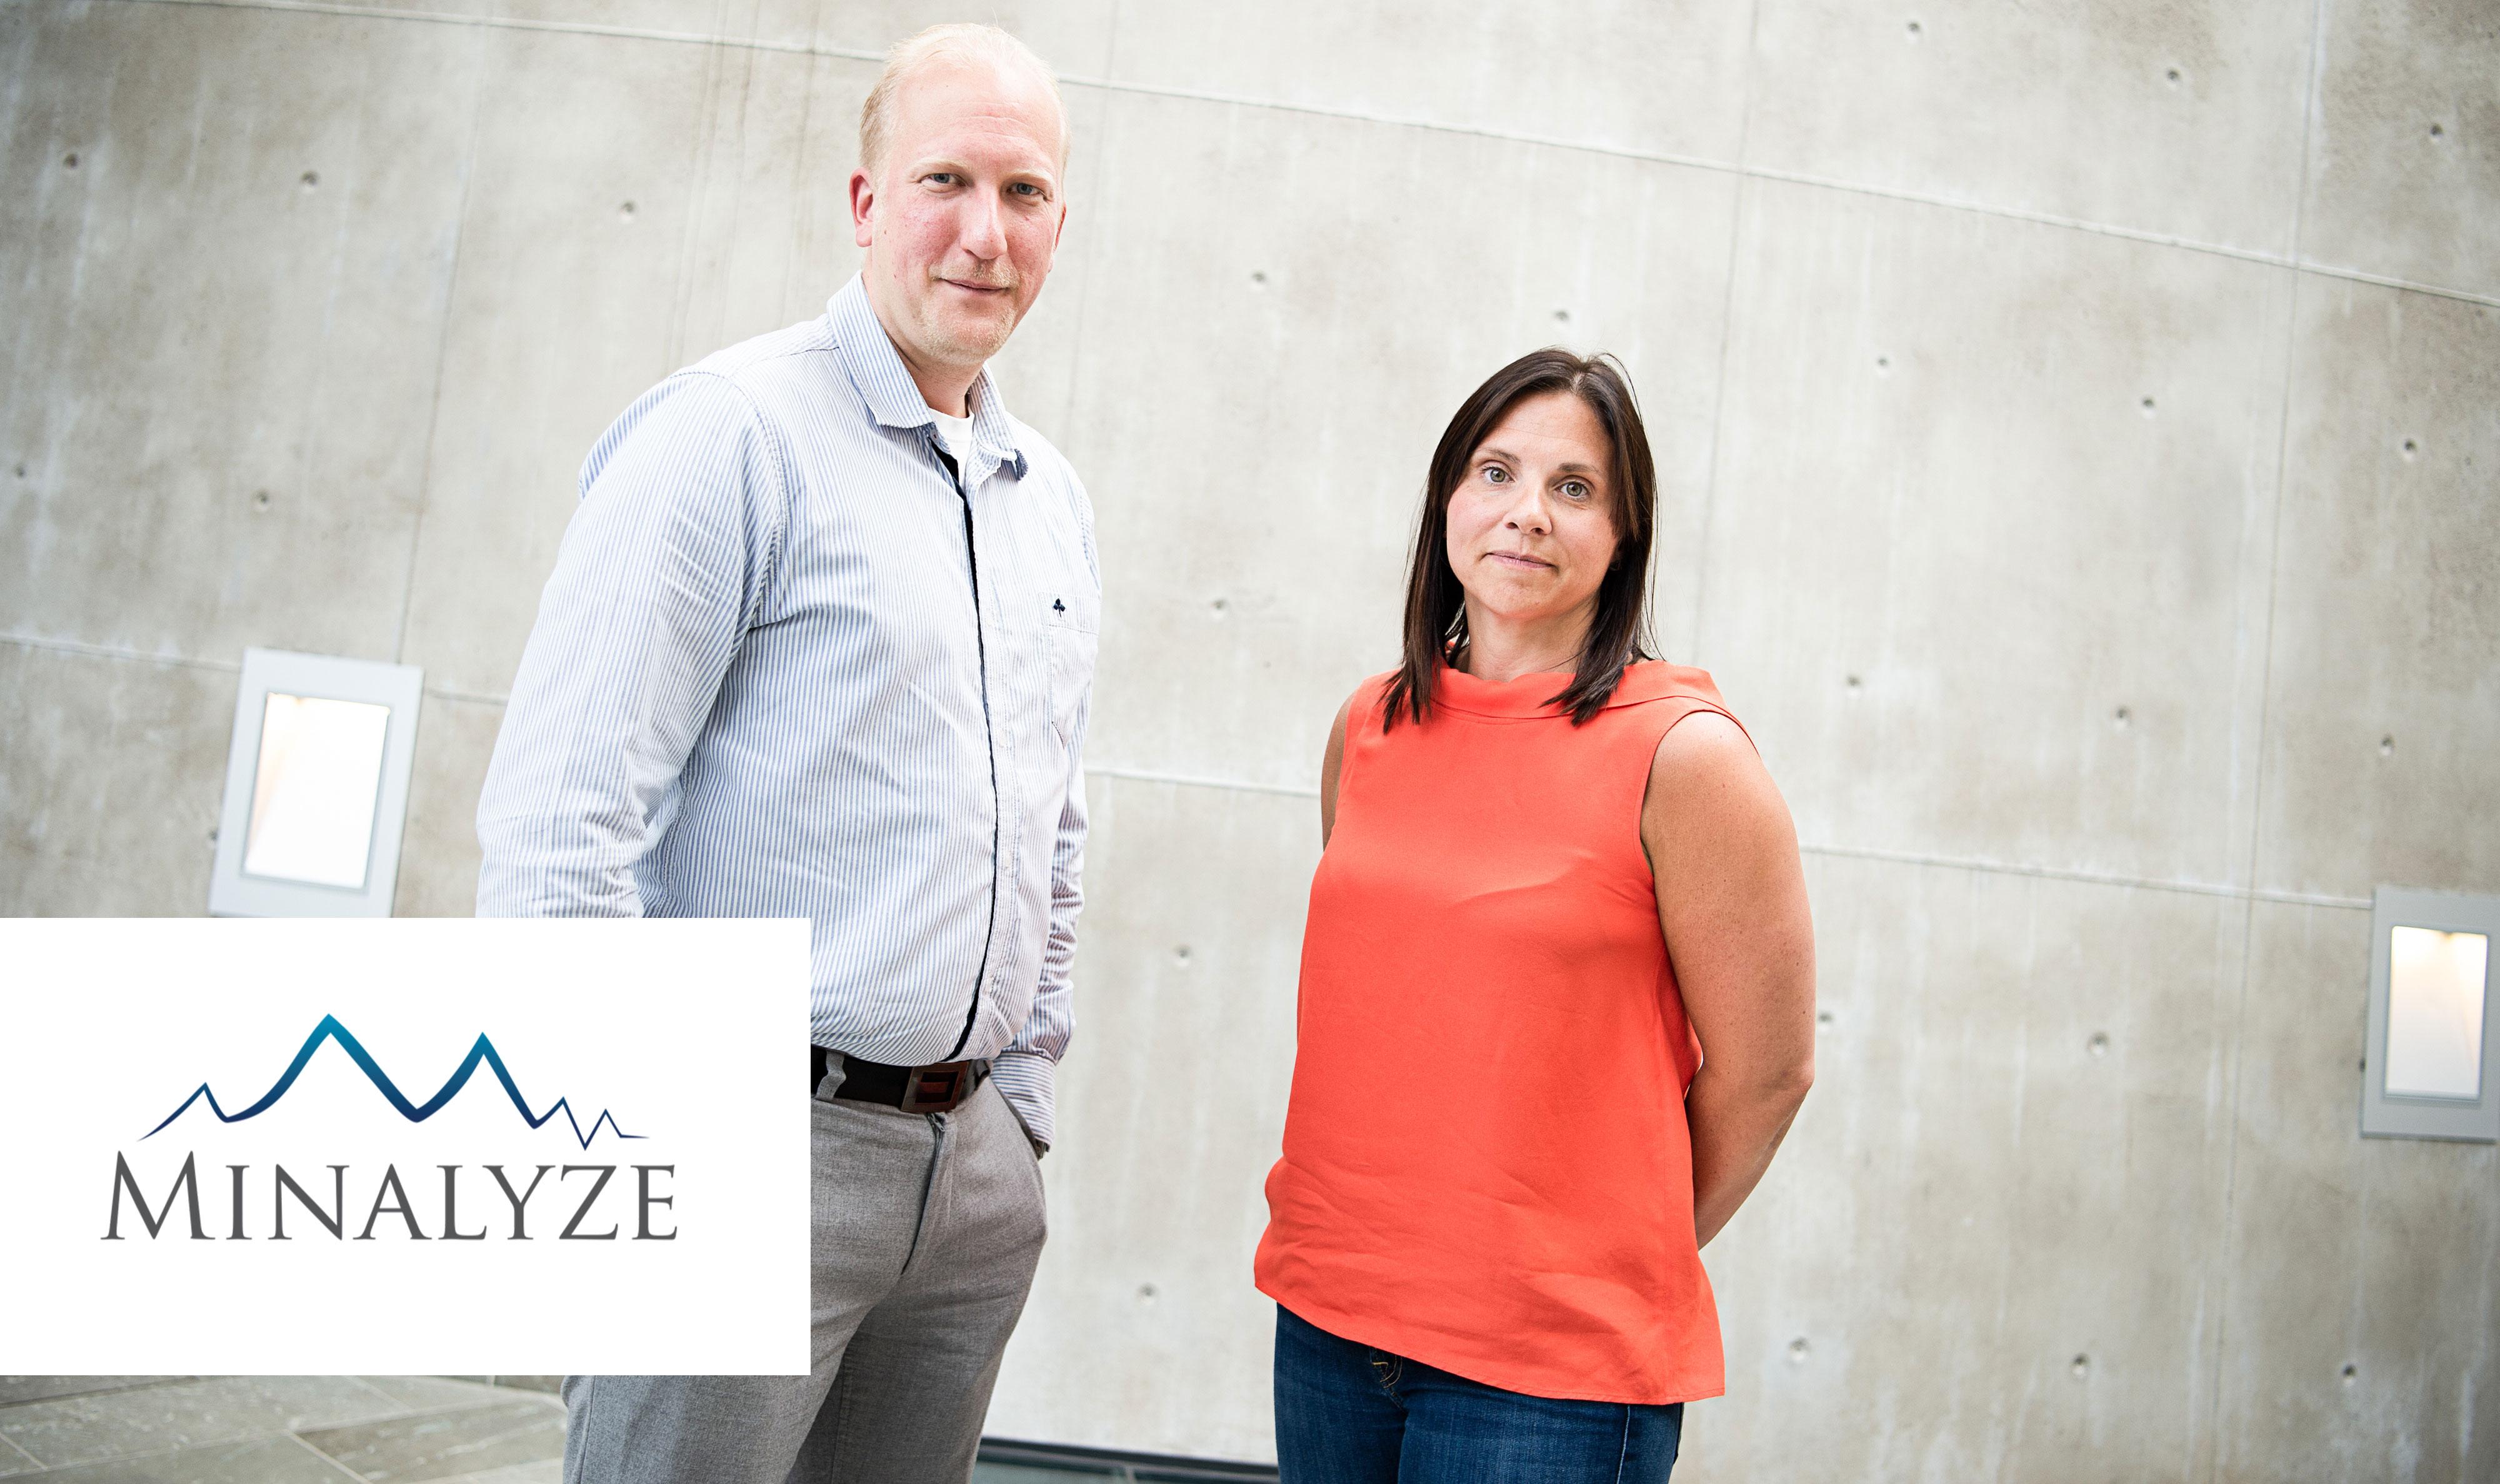 startup-stories-chalmers-ventures-landscape-minealyze